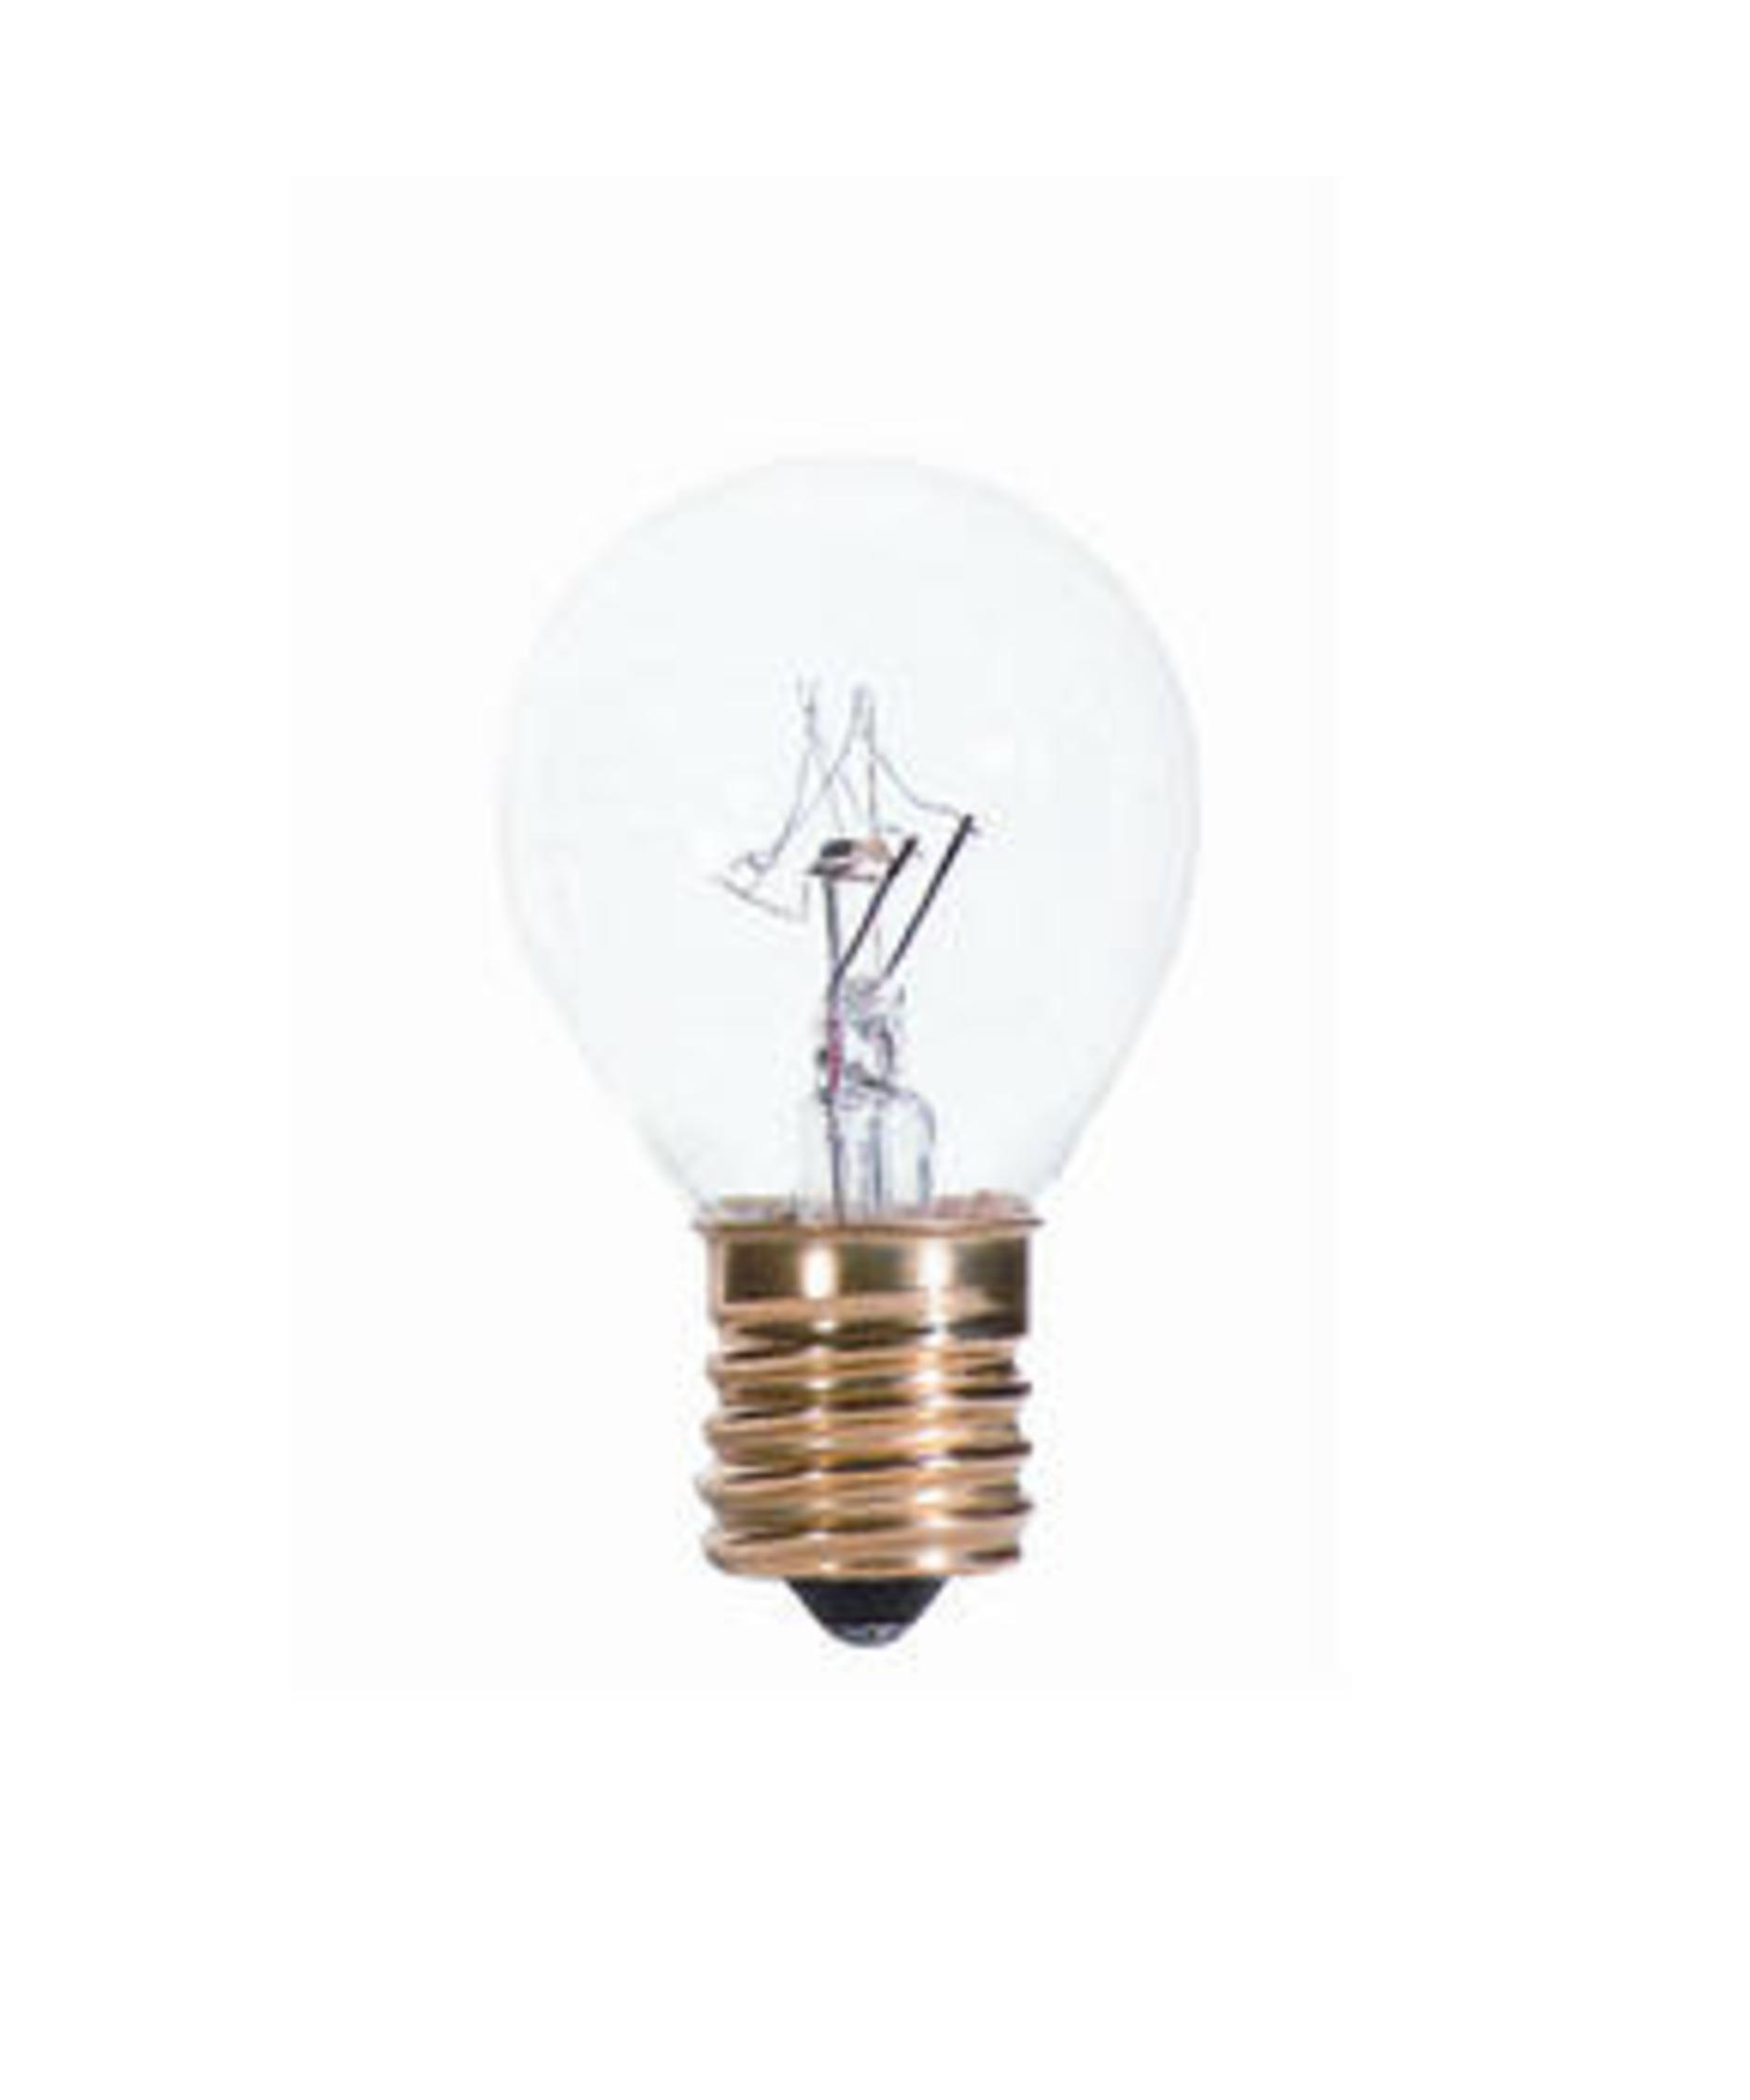 Bulbrite 40s11n C 40 Watt 120 Volt Clear High Intensity S11 Bulb